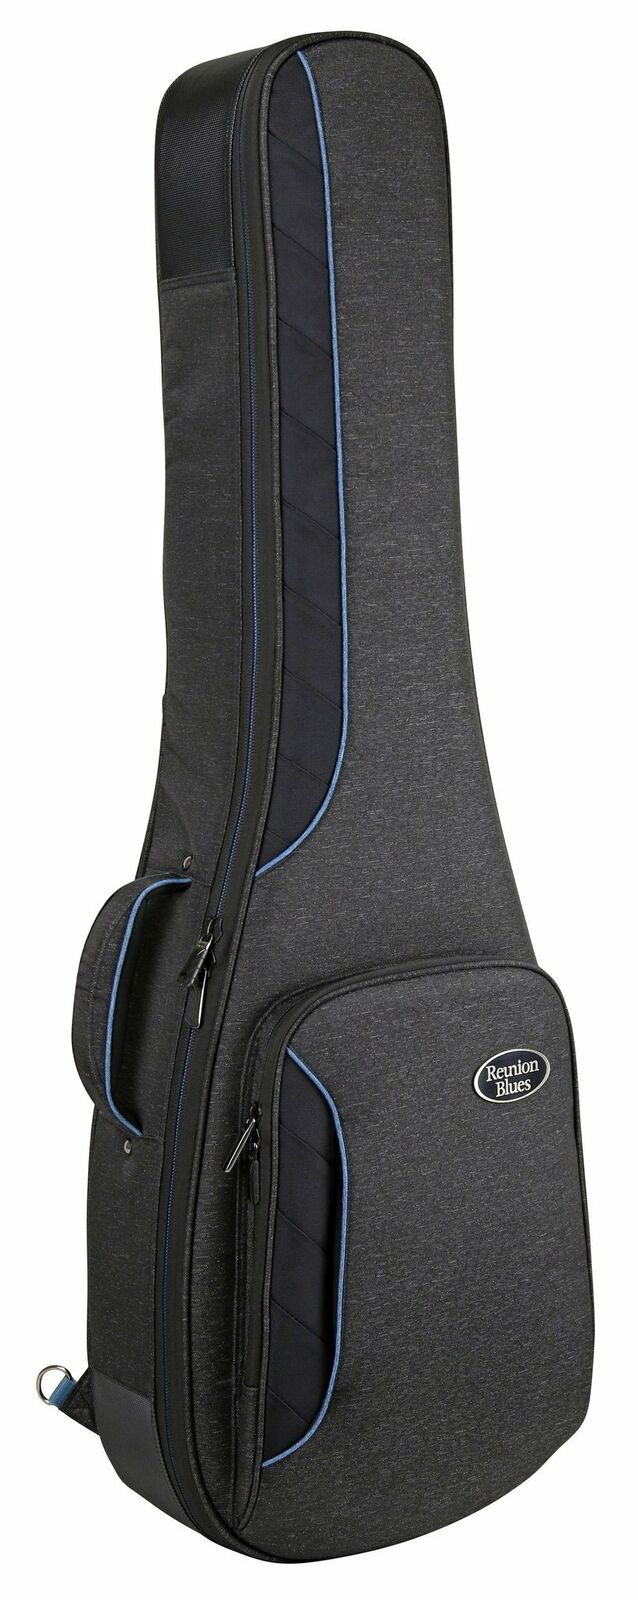 Reunion Blaus Continental Voyager LP Style Guitar Gig Bag